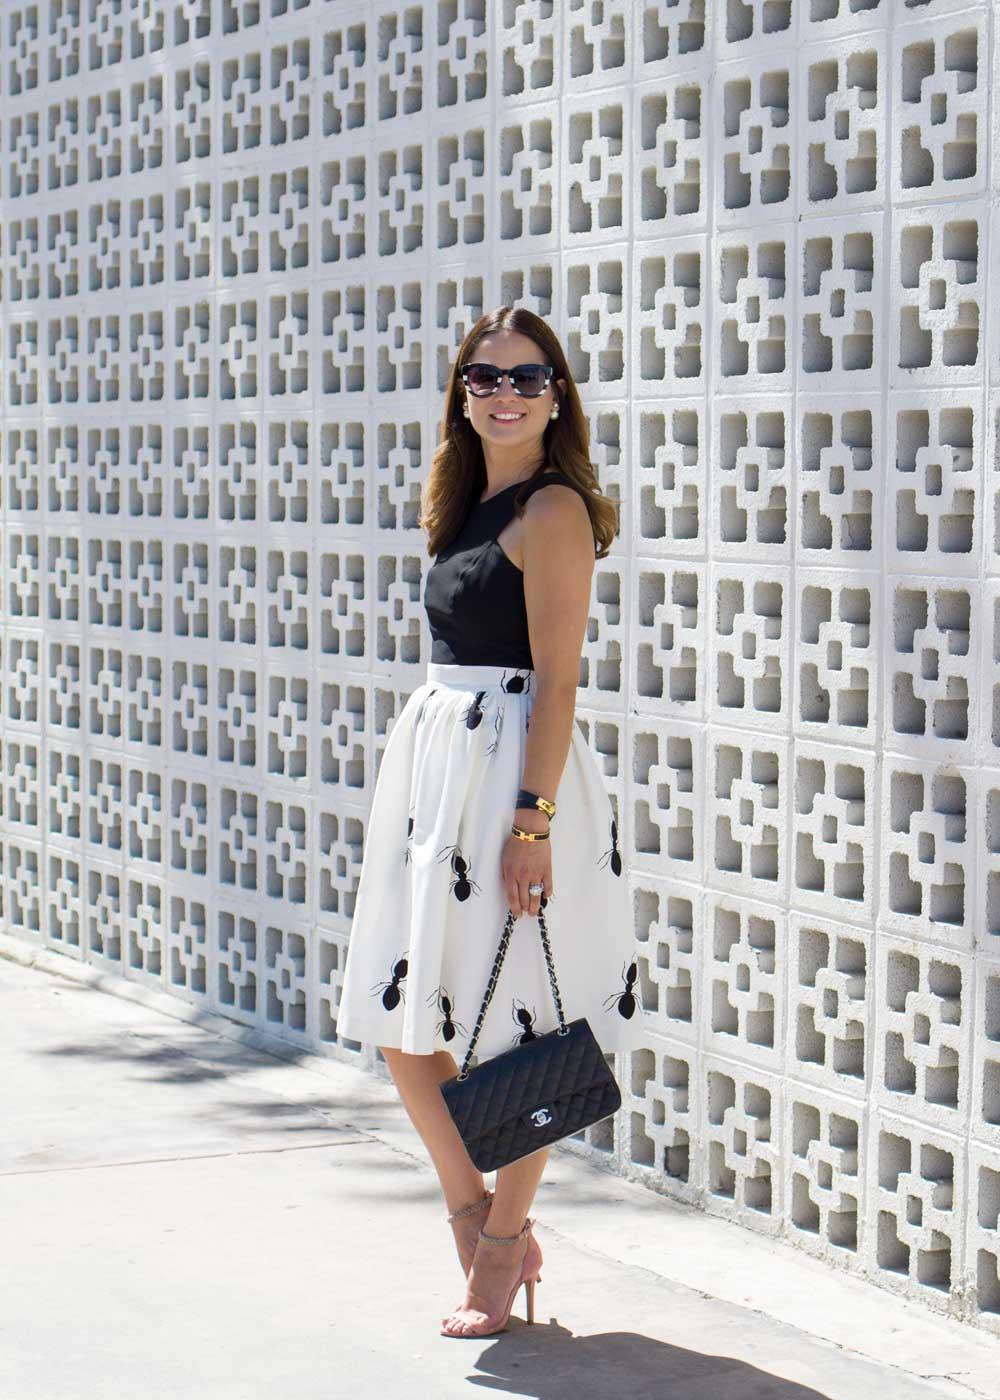 Parker Palm Springs Fashion Blogger